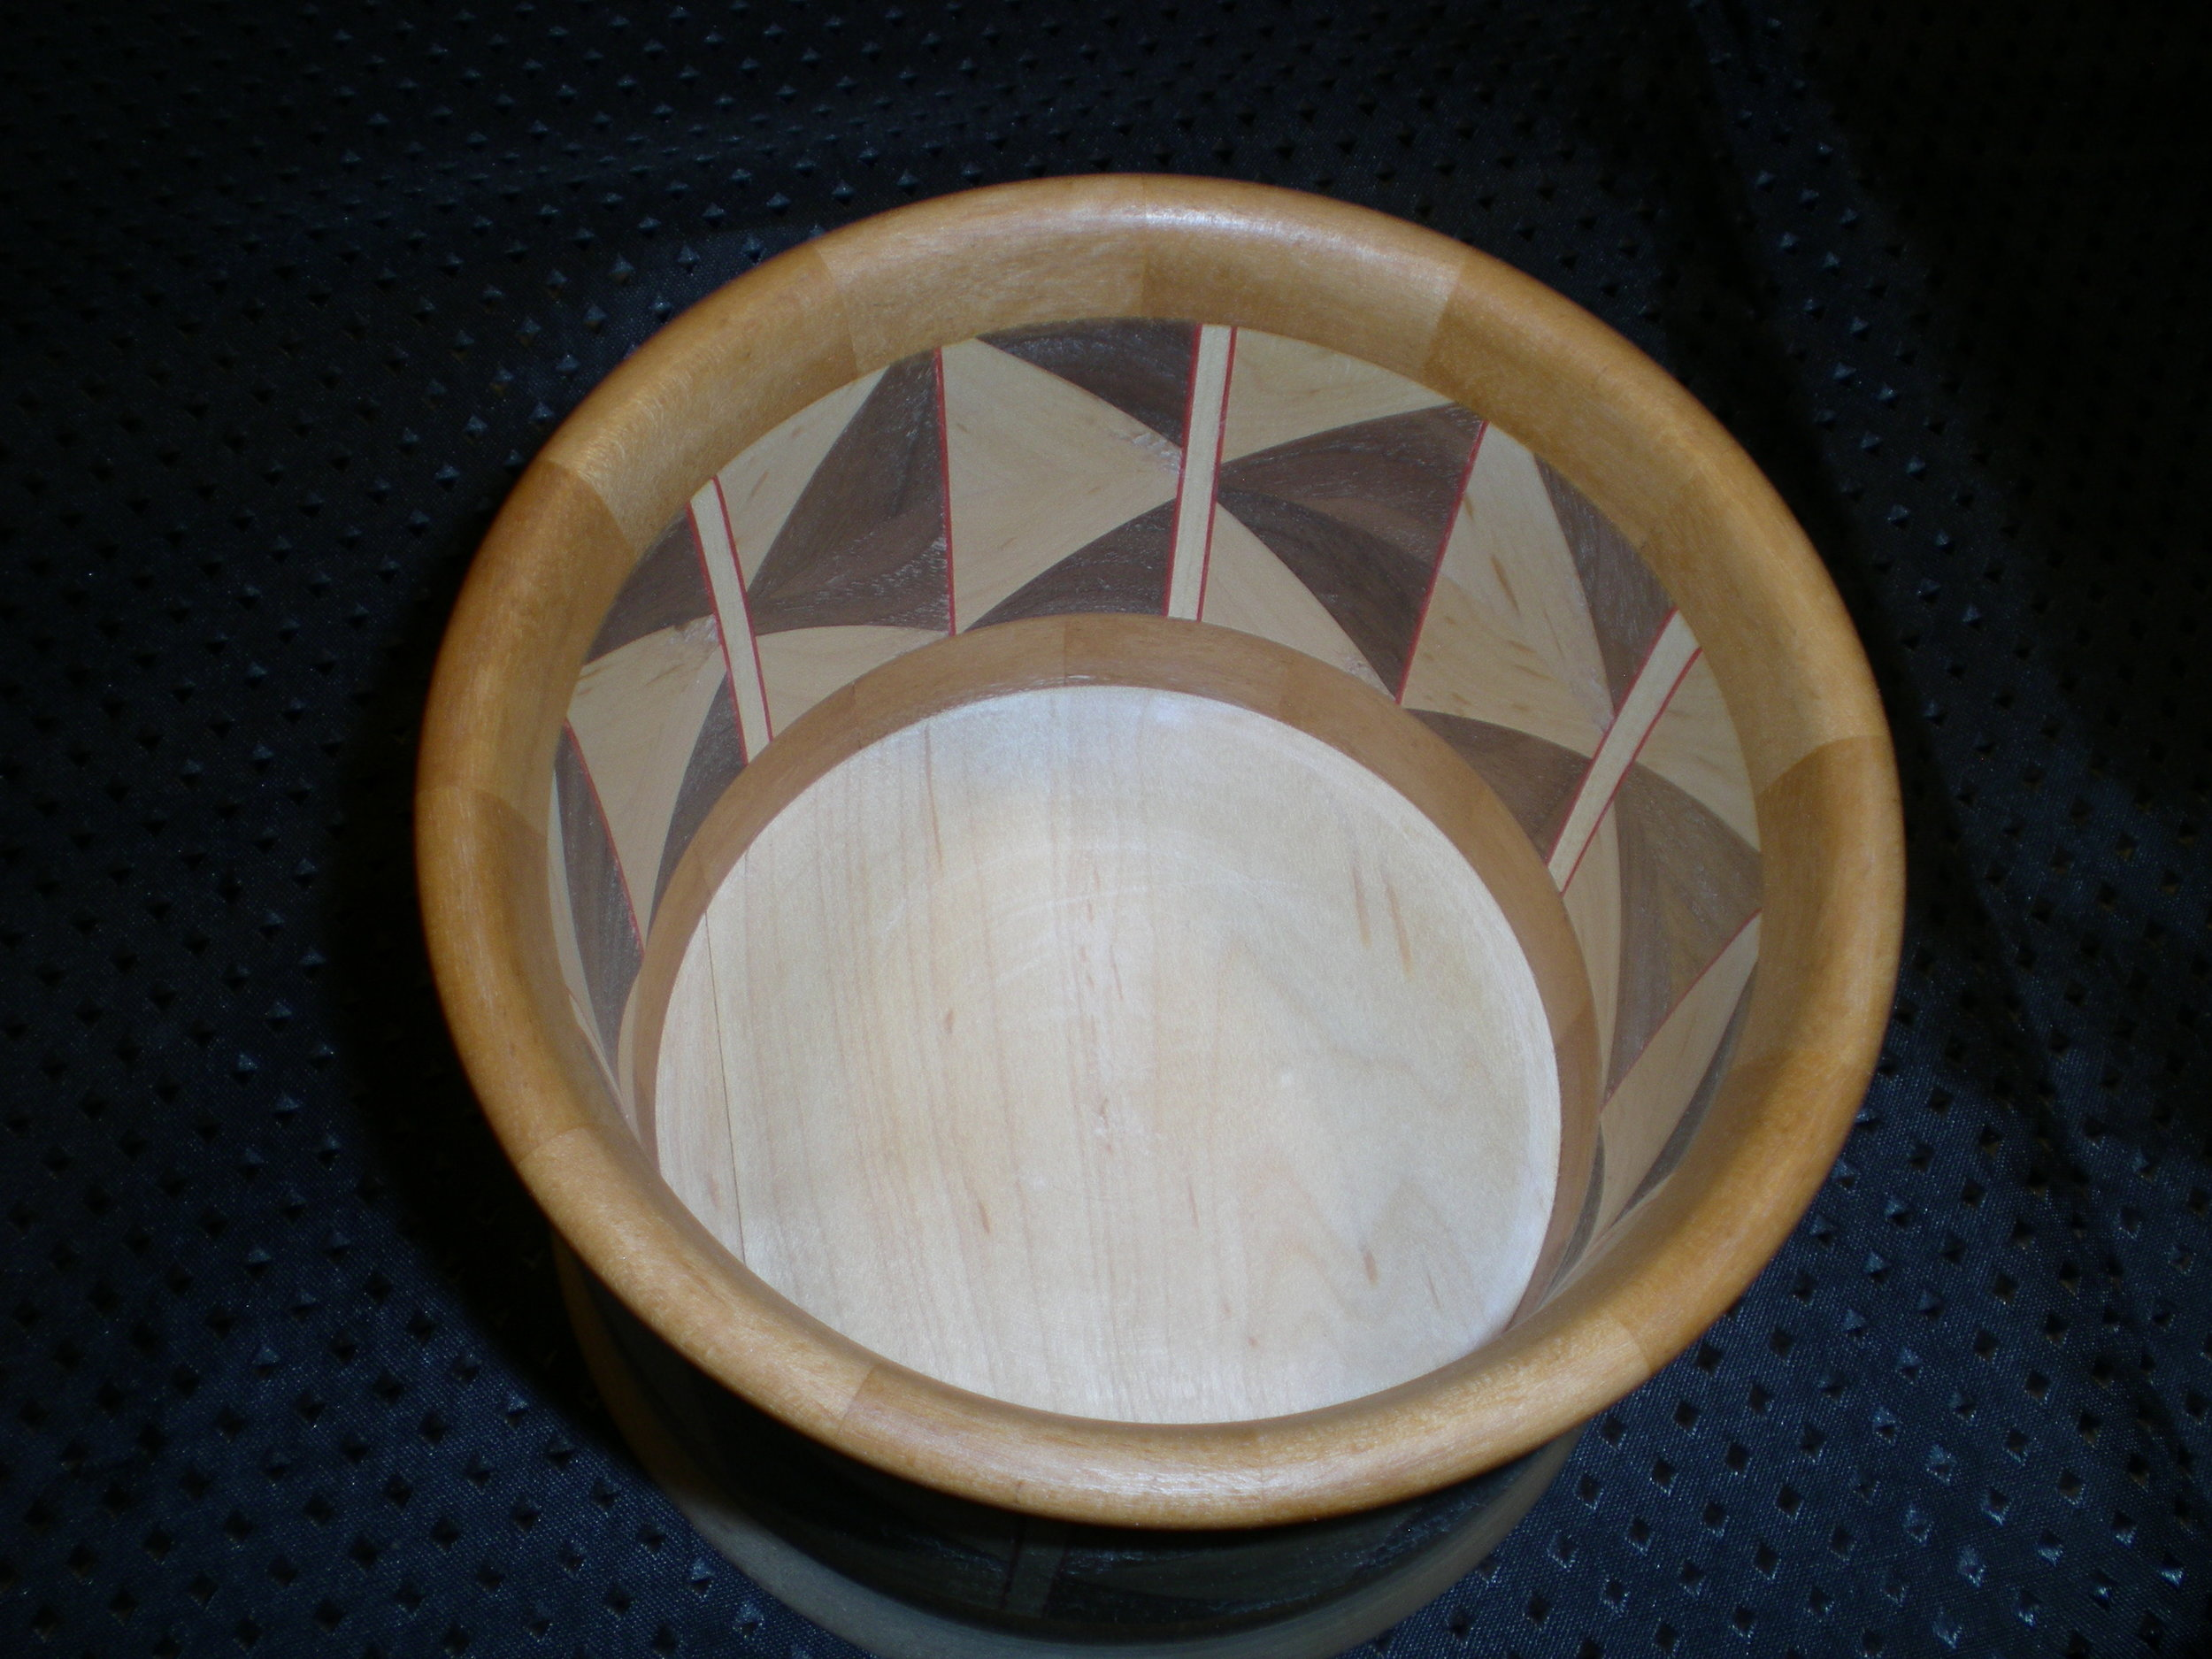 RJC Wood Creations - Bowls (13).JPG